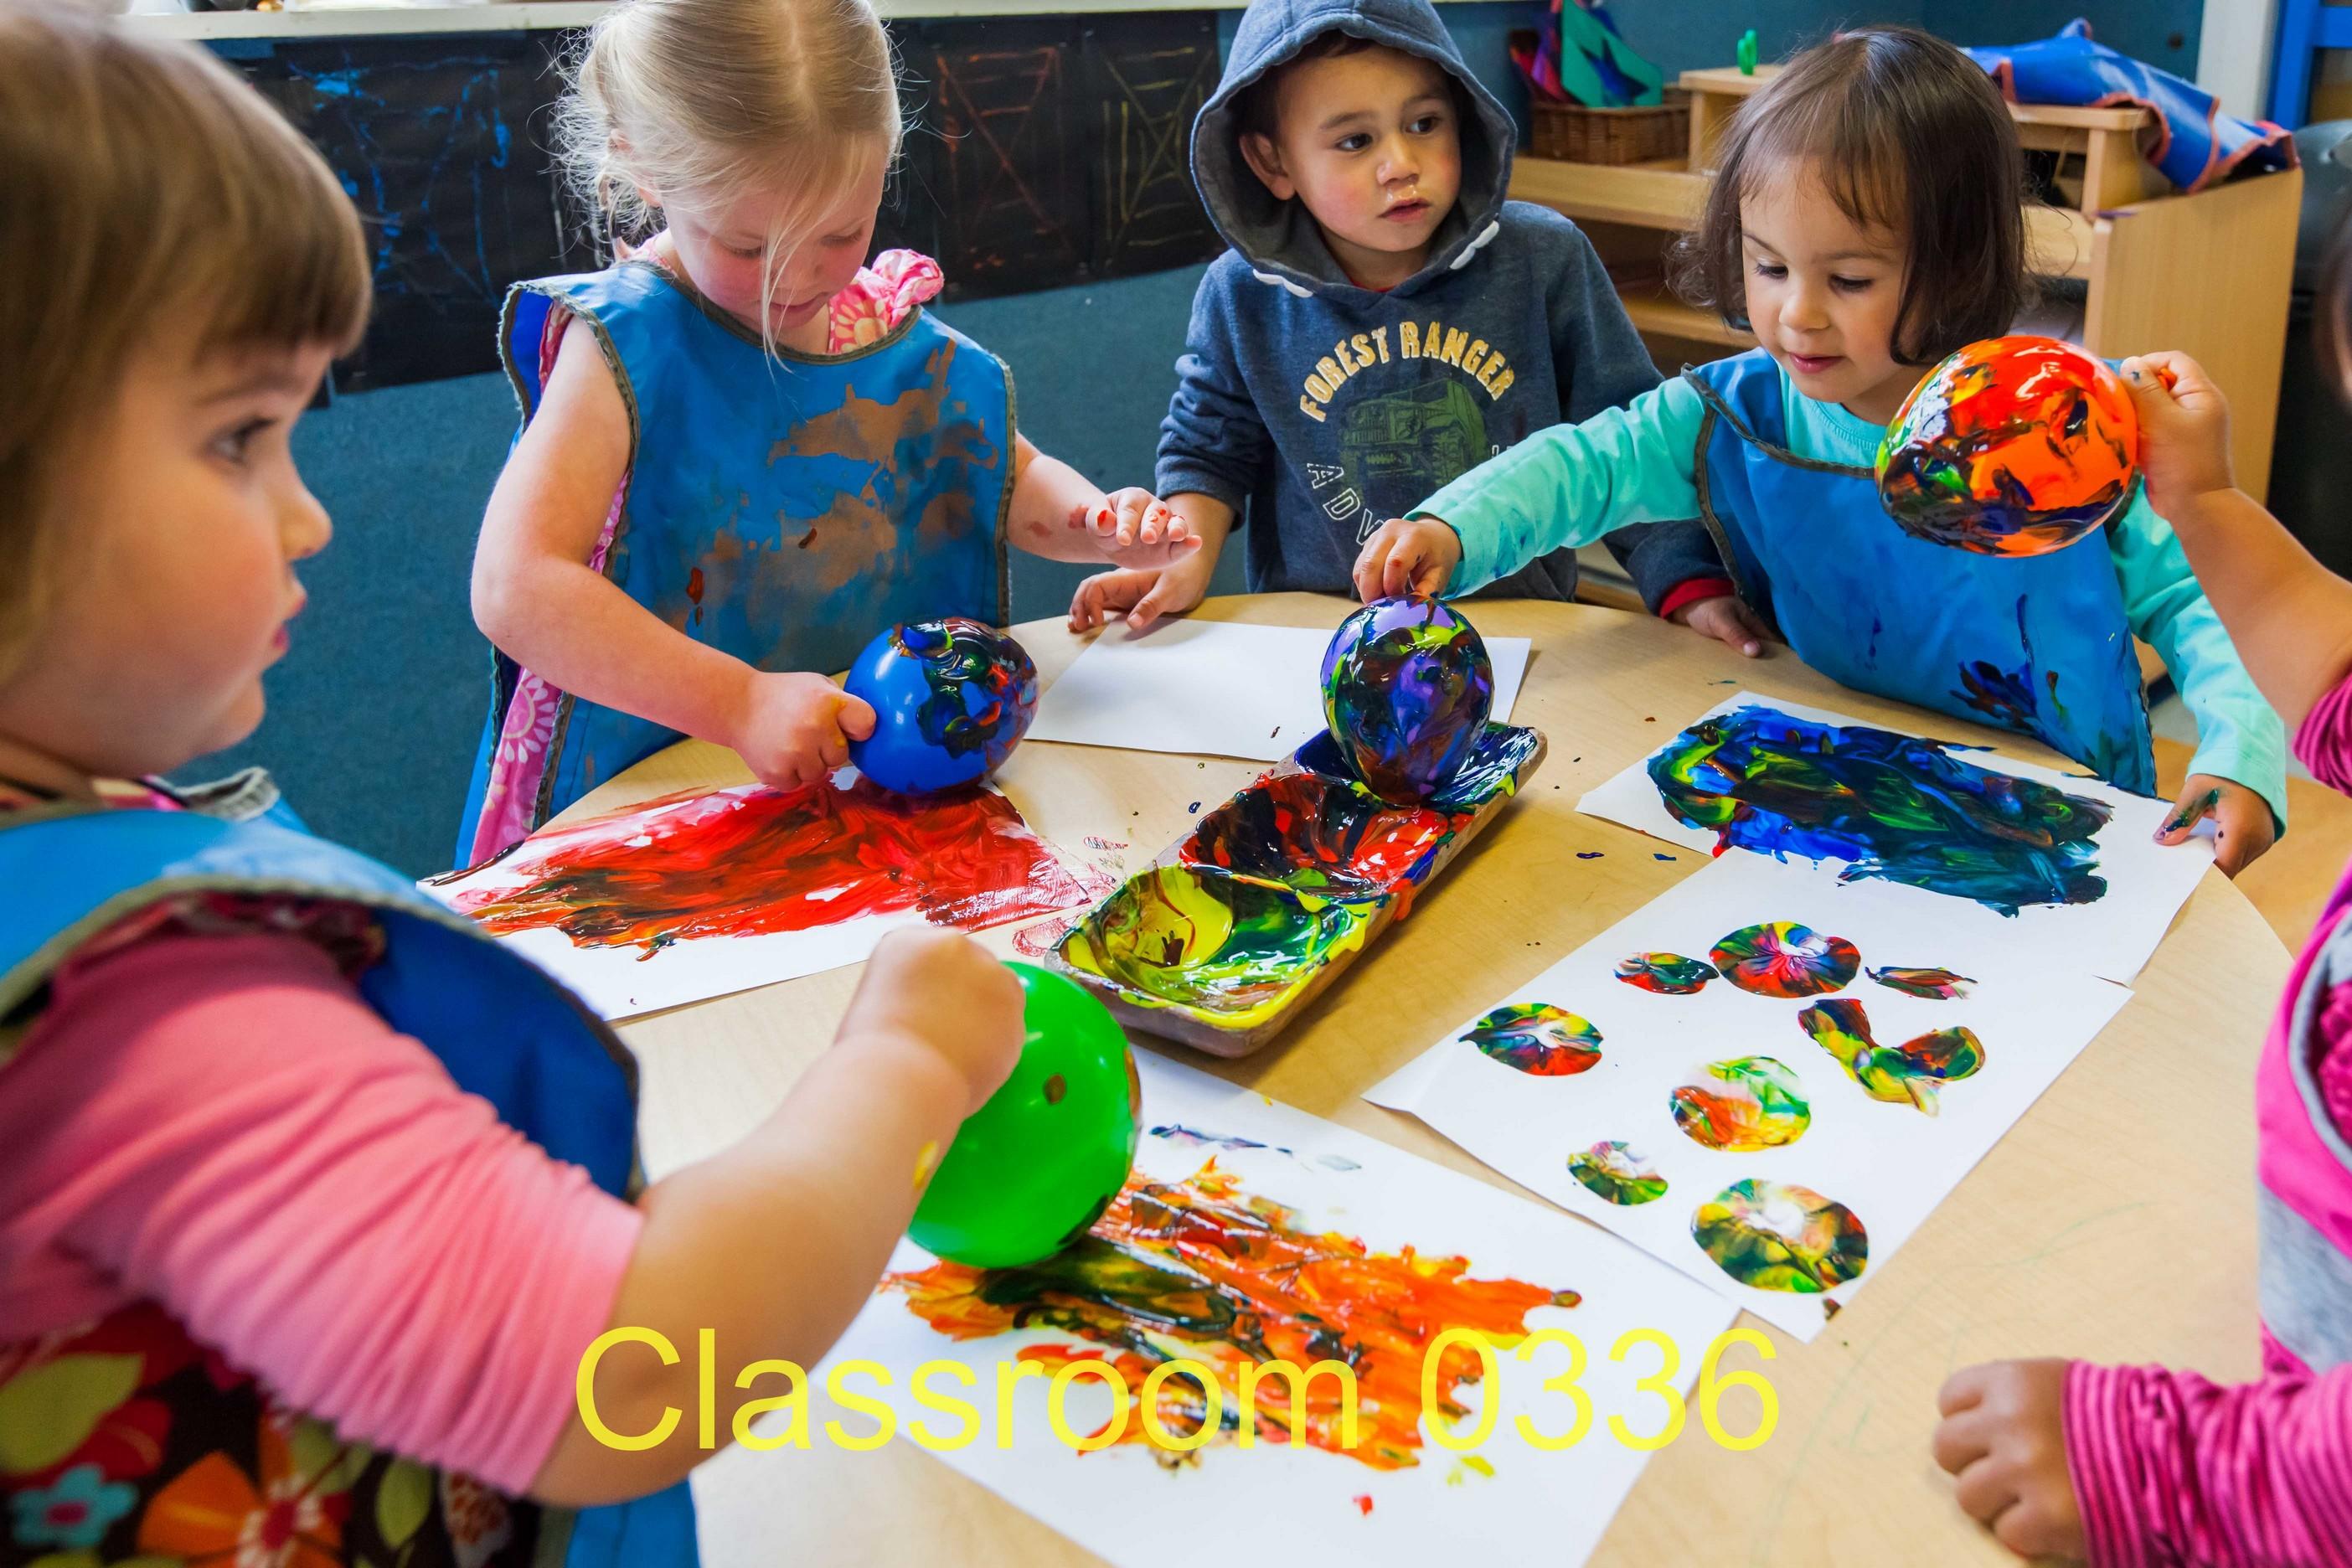 Classroom 0336